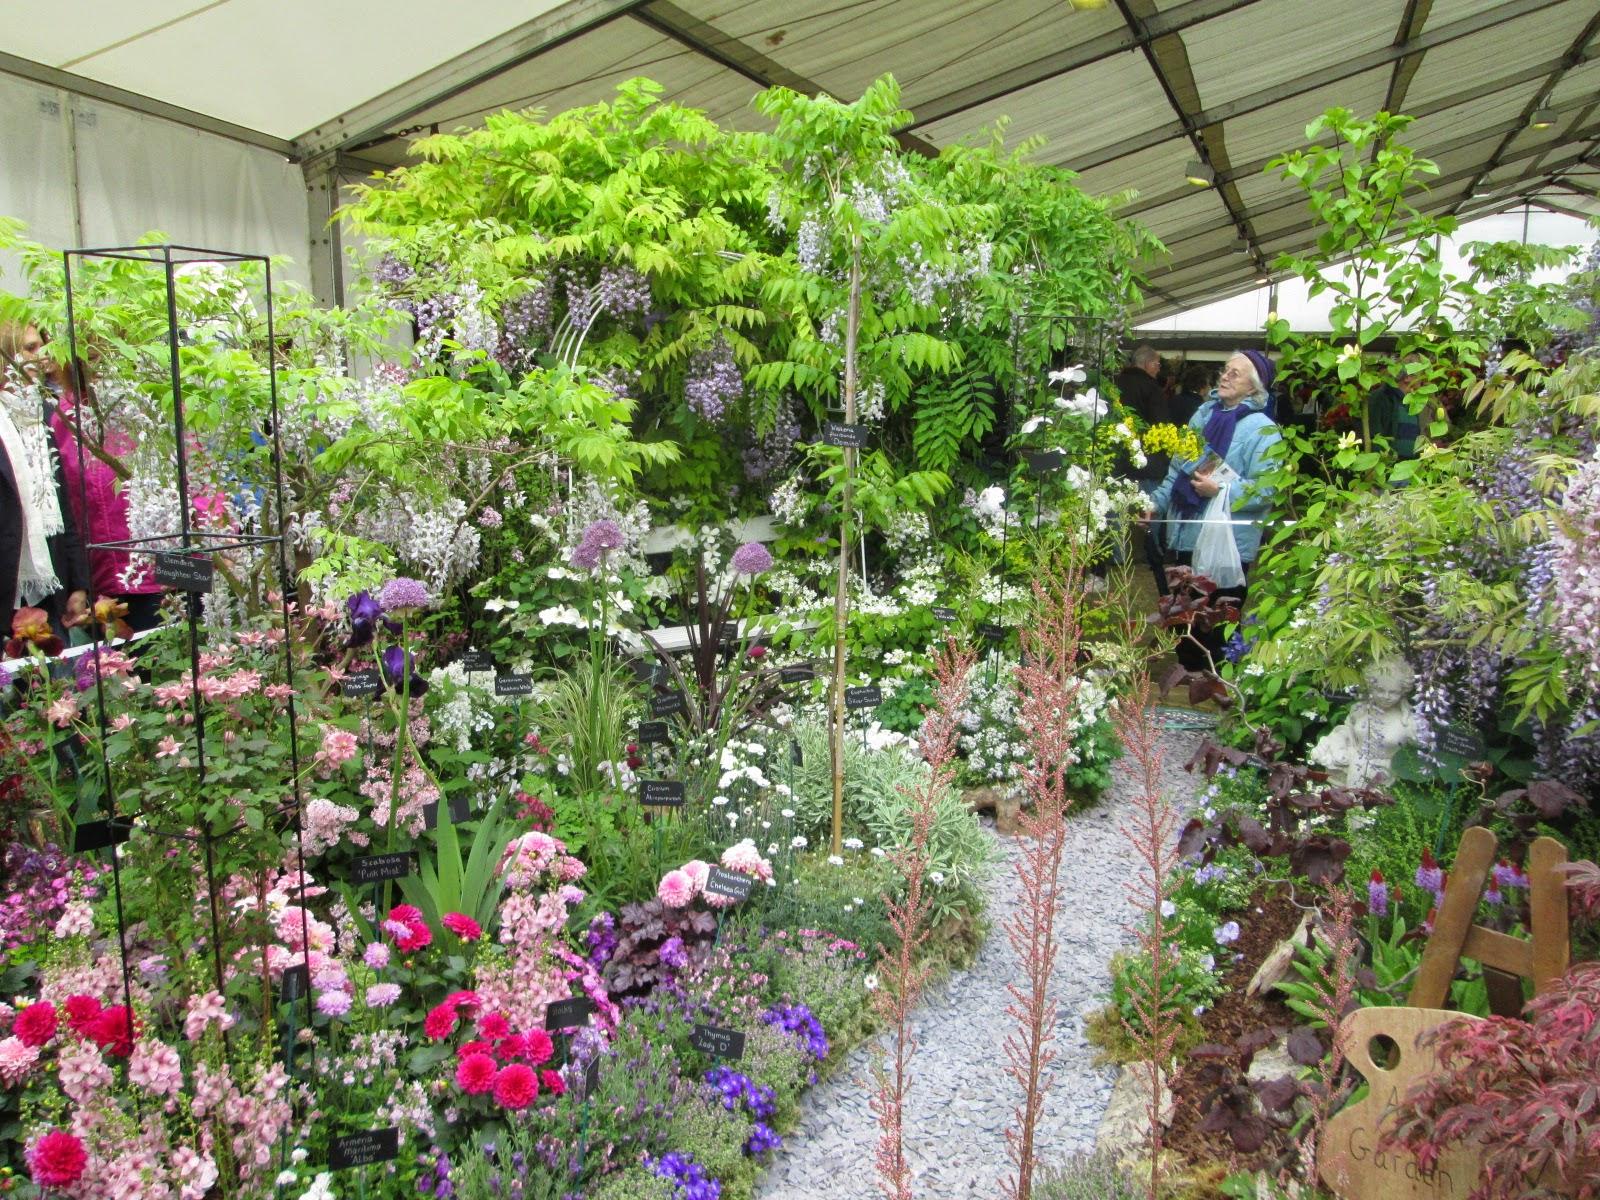 Lemon verbena lady 39 s herb garden rhs malvern spring for Garden design fest 2014